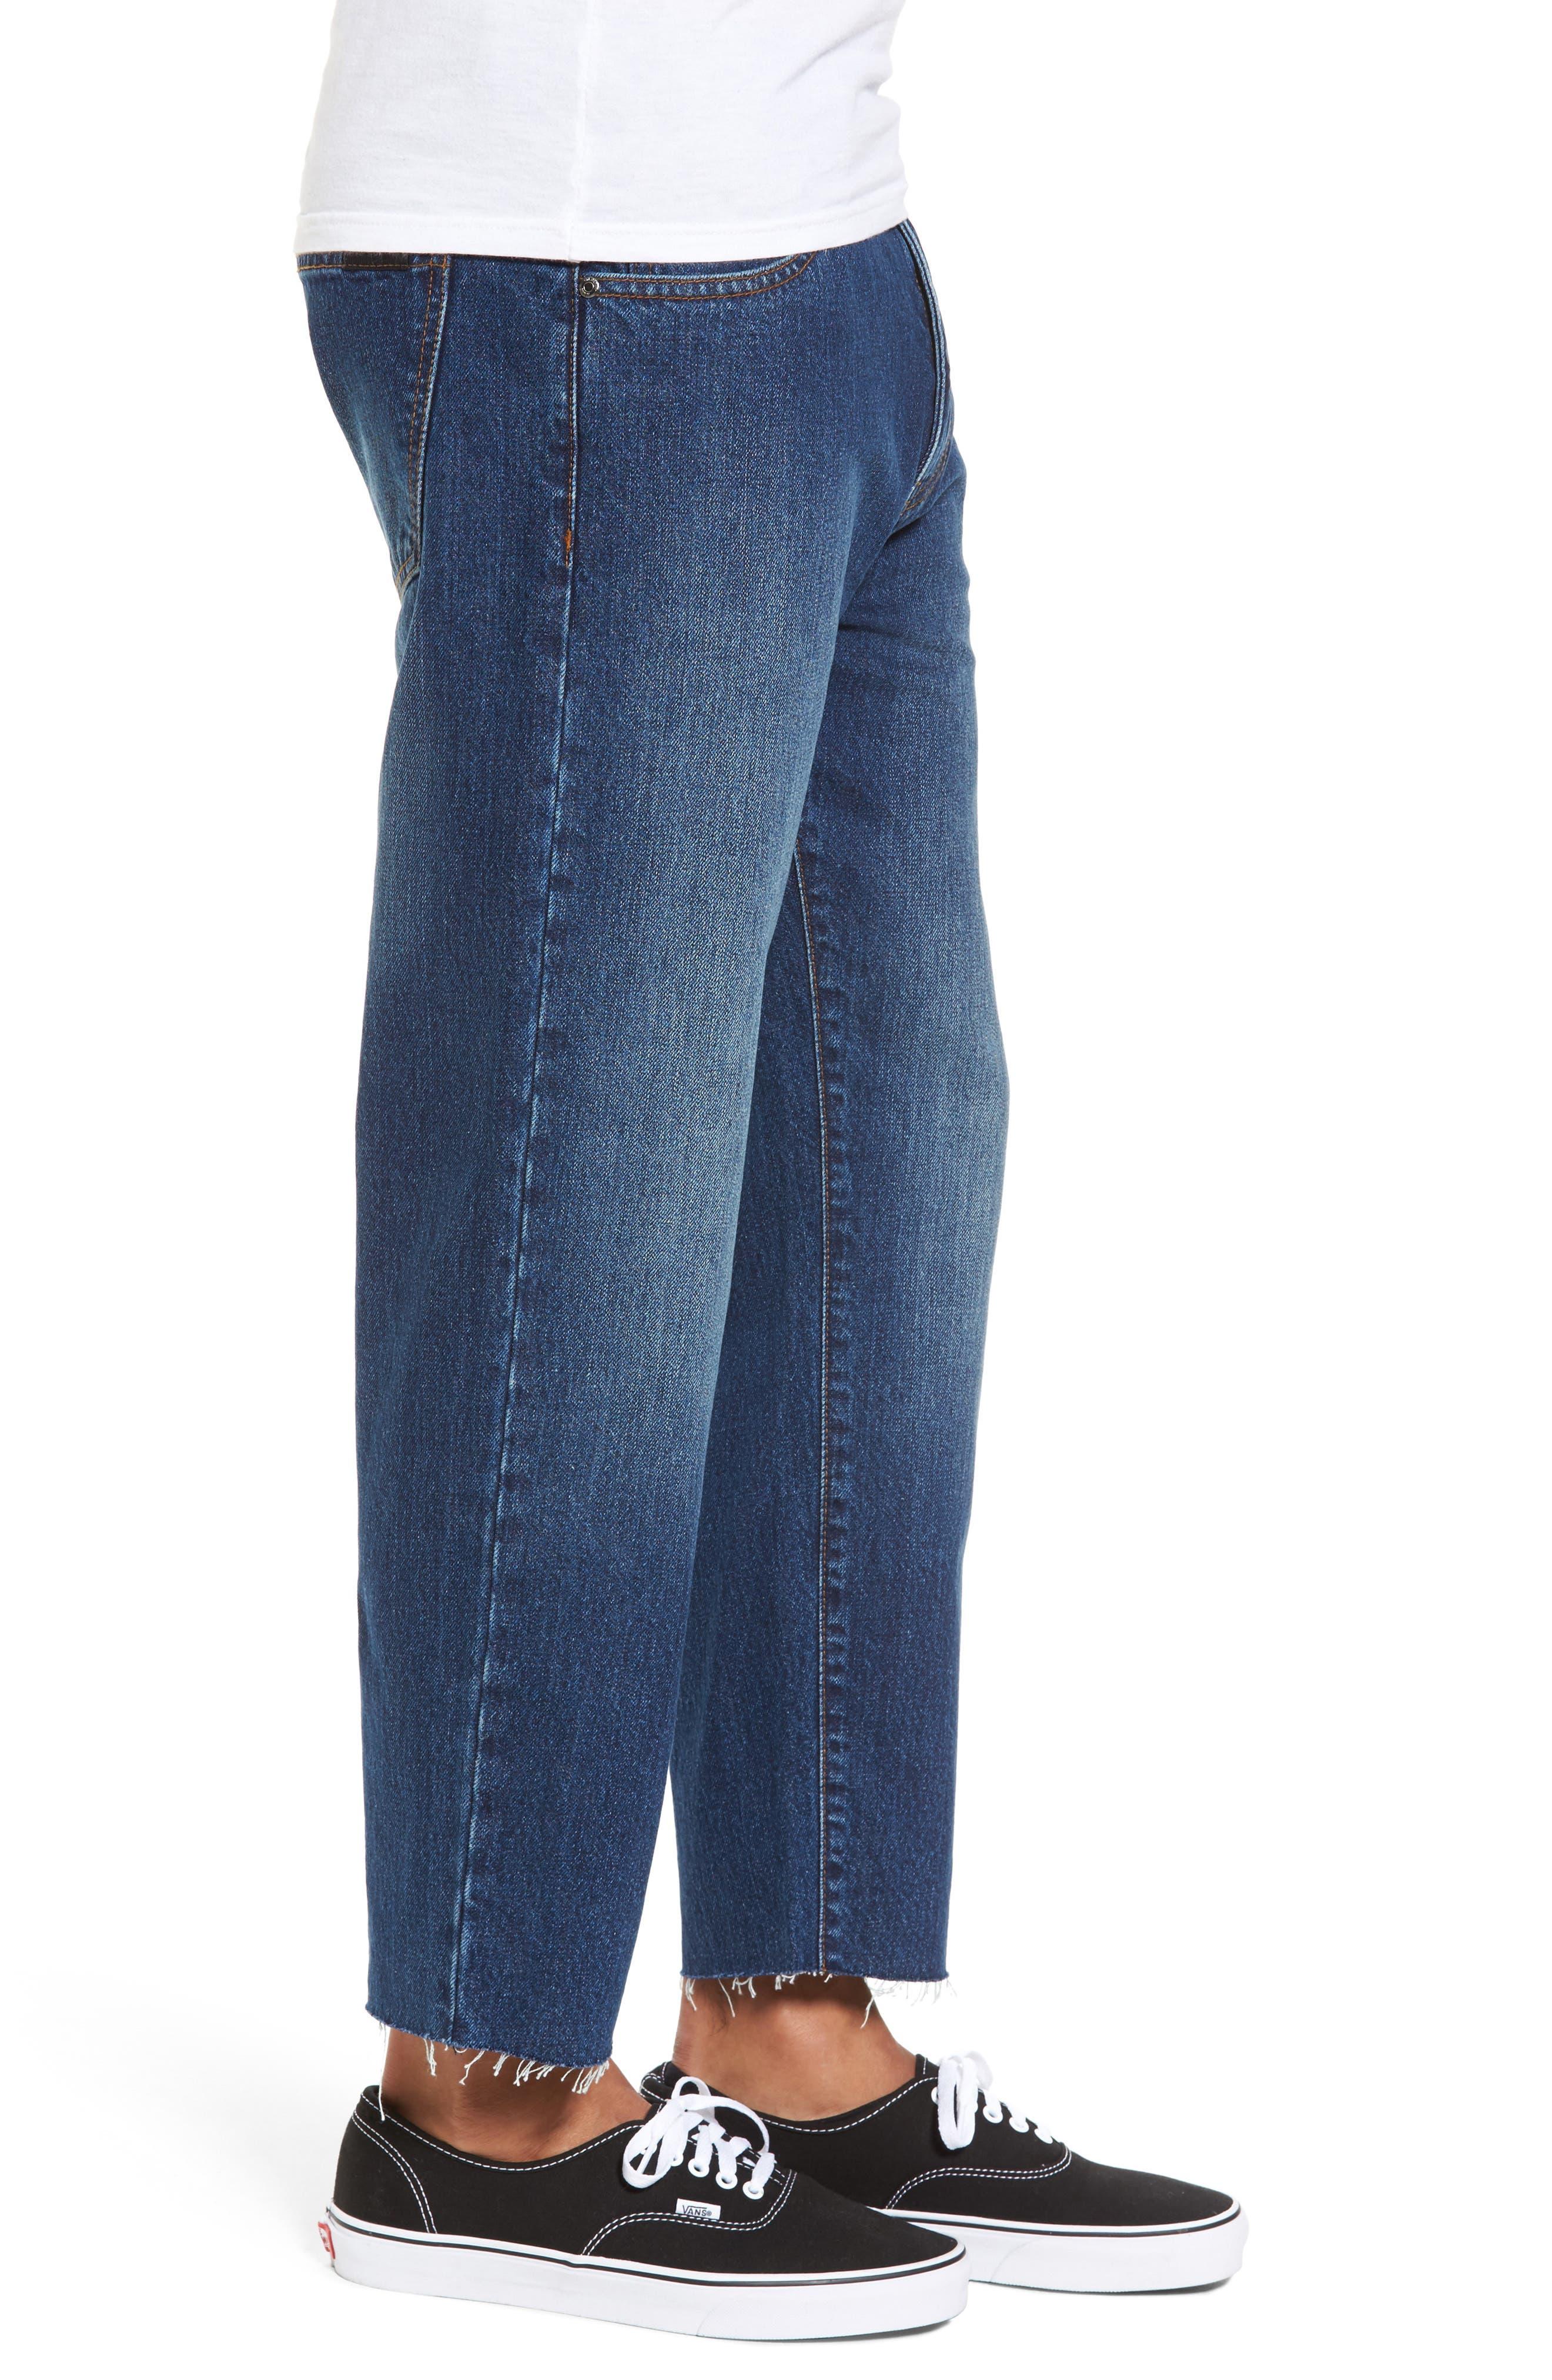 Otis Straight Fit Crop Jeans,                             Alternate thumbnail 3, color,                             Worn Mid Blue Raw Hem